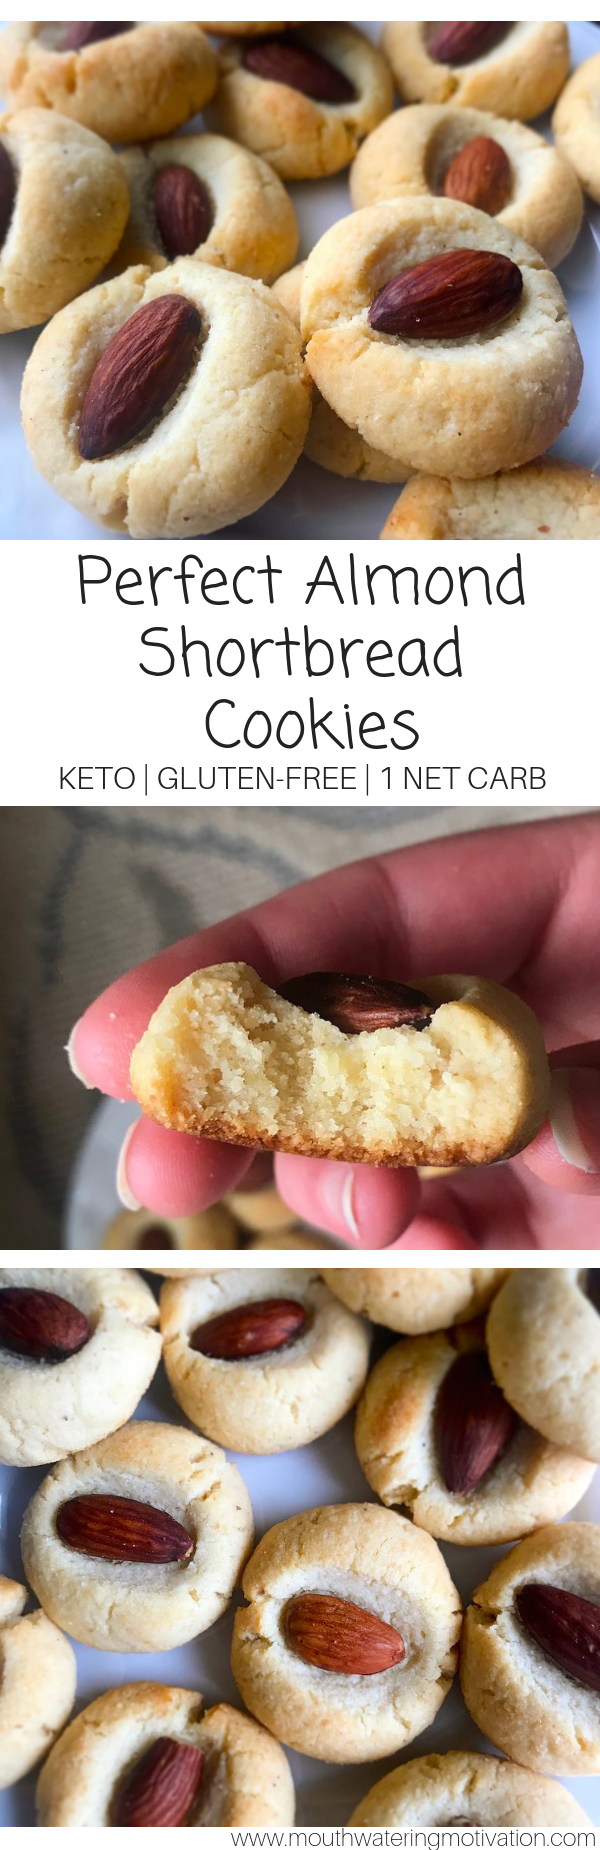 perfect keto shortbread cookies